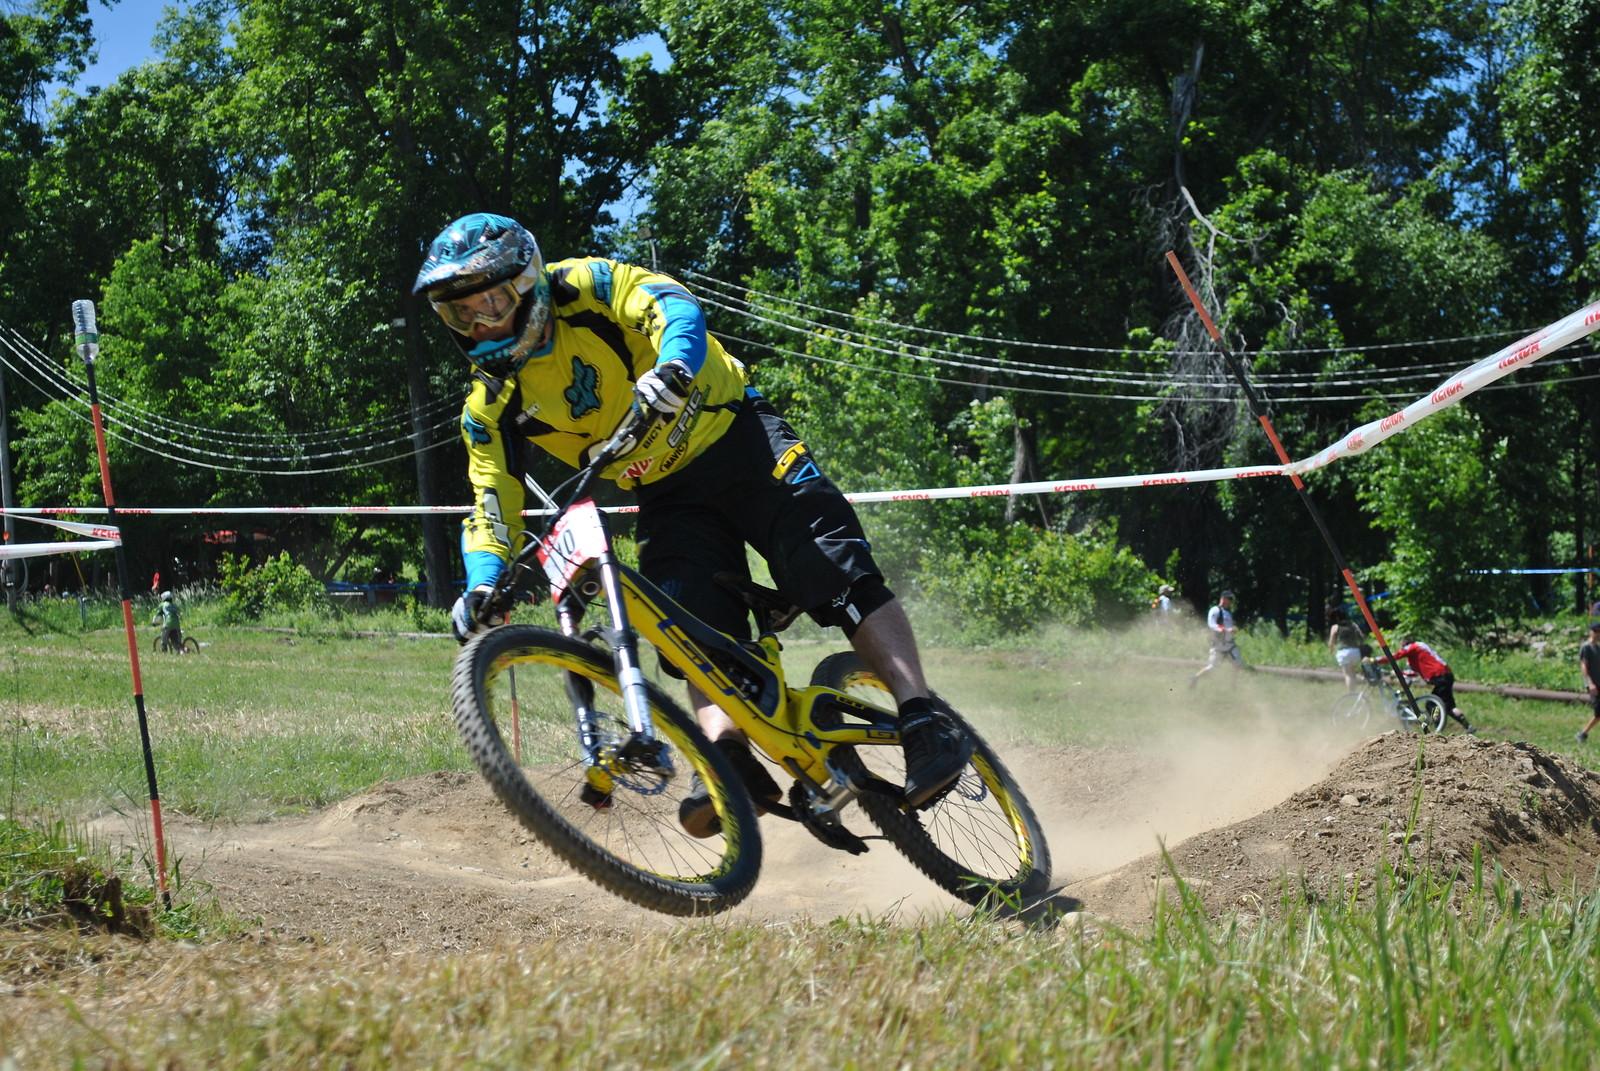 DSC_0482 - RodHaSkE - Mountain Biking Pictures - Vital MTB